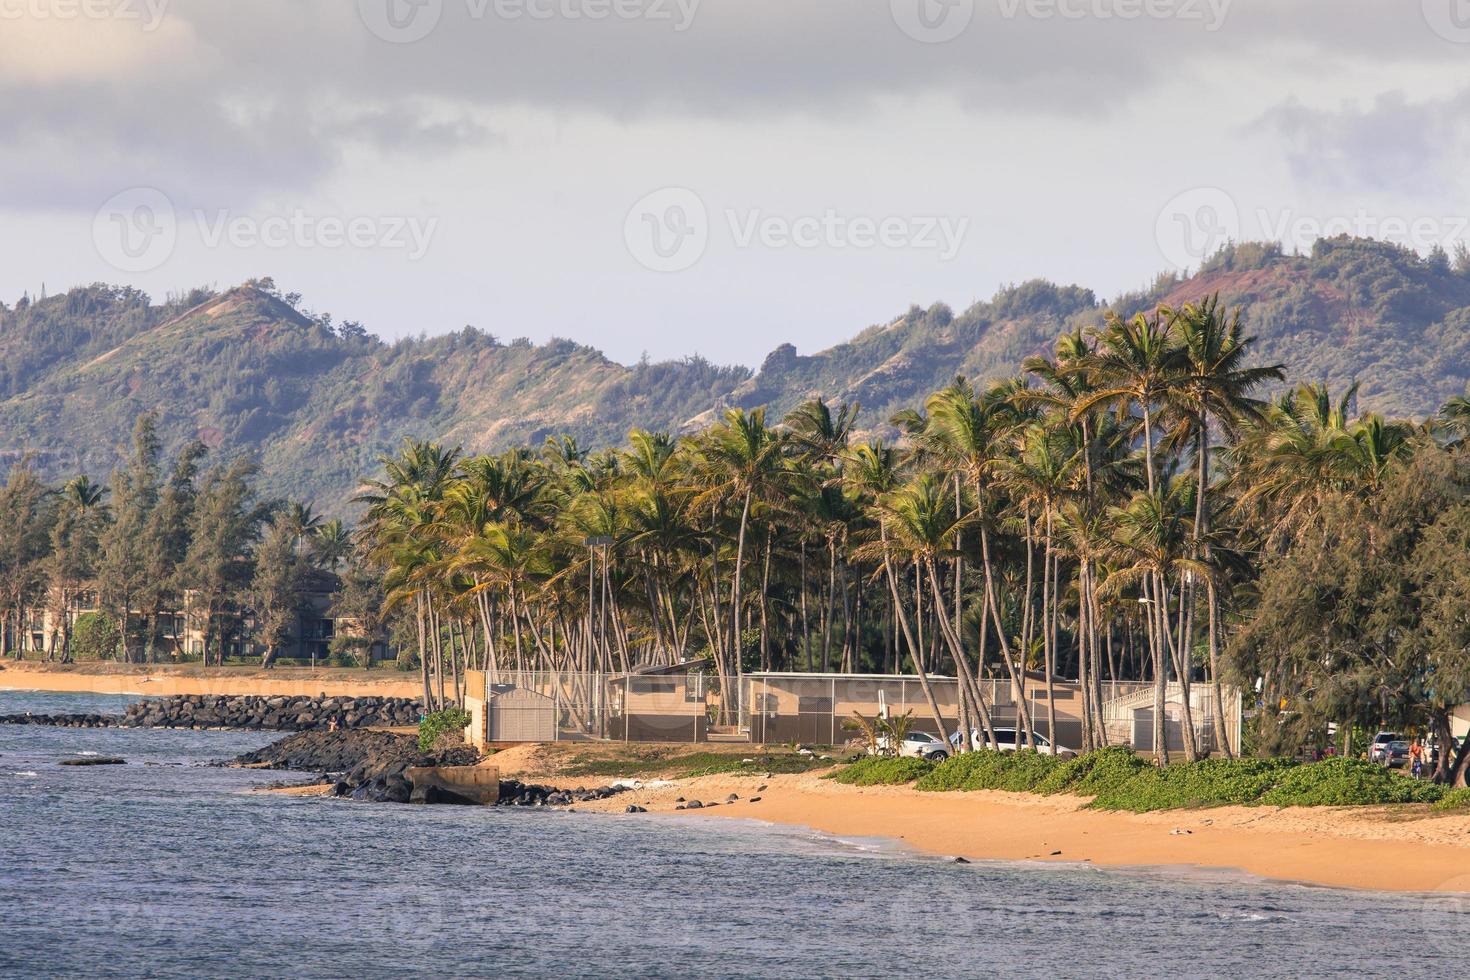 kokospalm boom op het zandstrand in kapaa hawaii foto